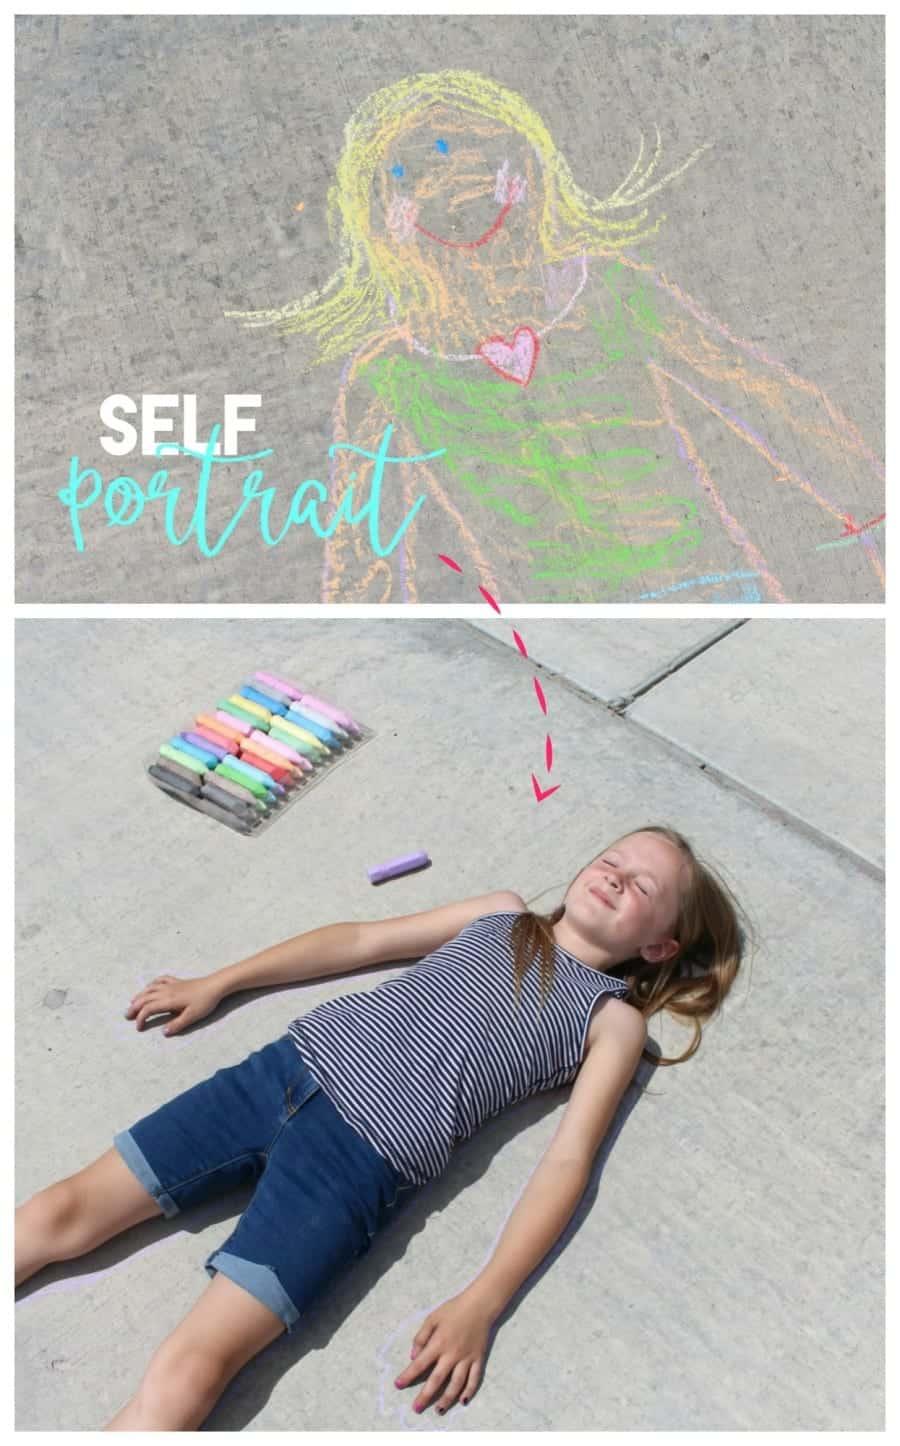 self portrait for fun chalk activity